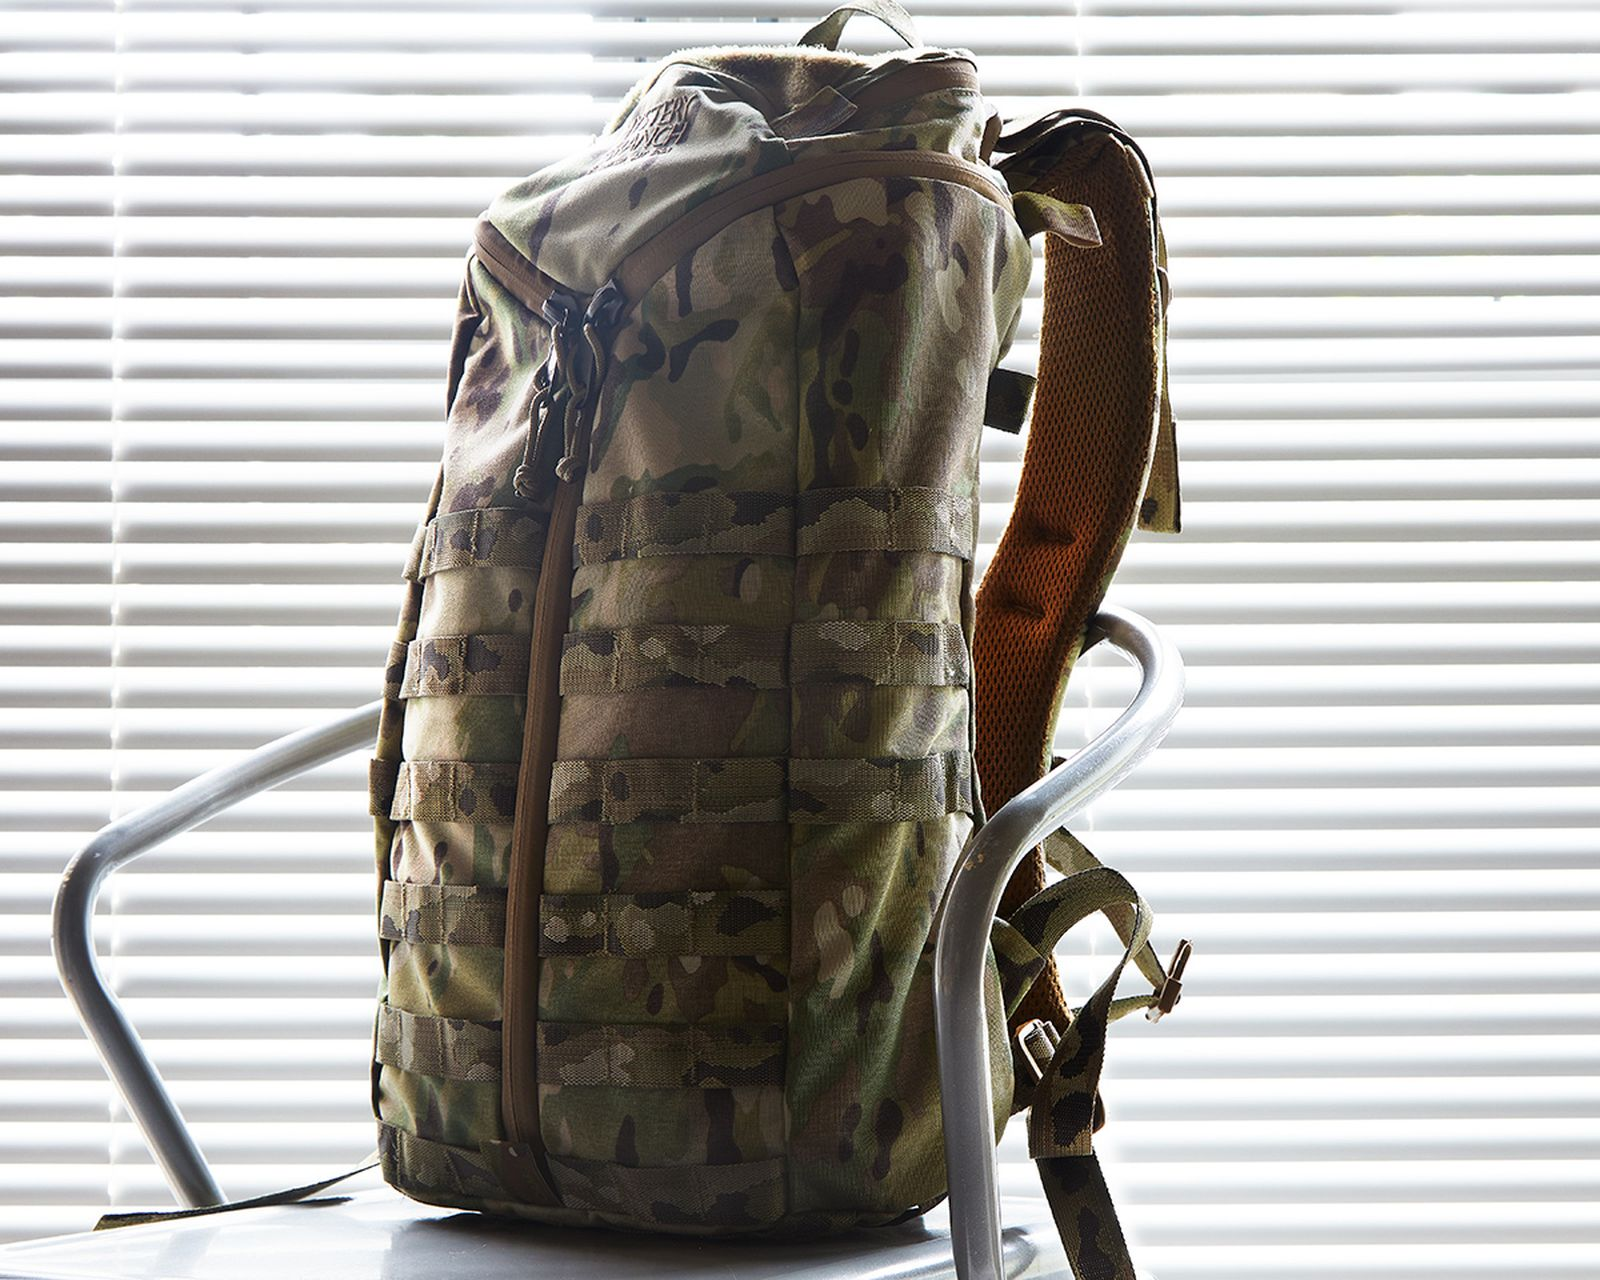 extreme-backpacks-jason-pietra-01